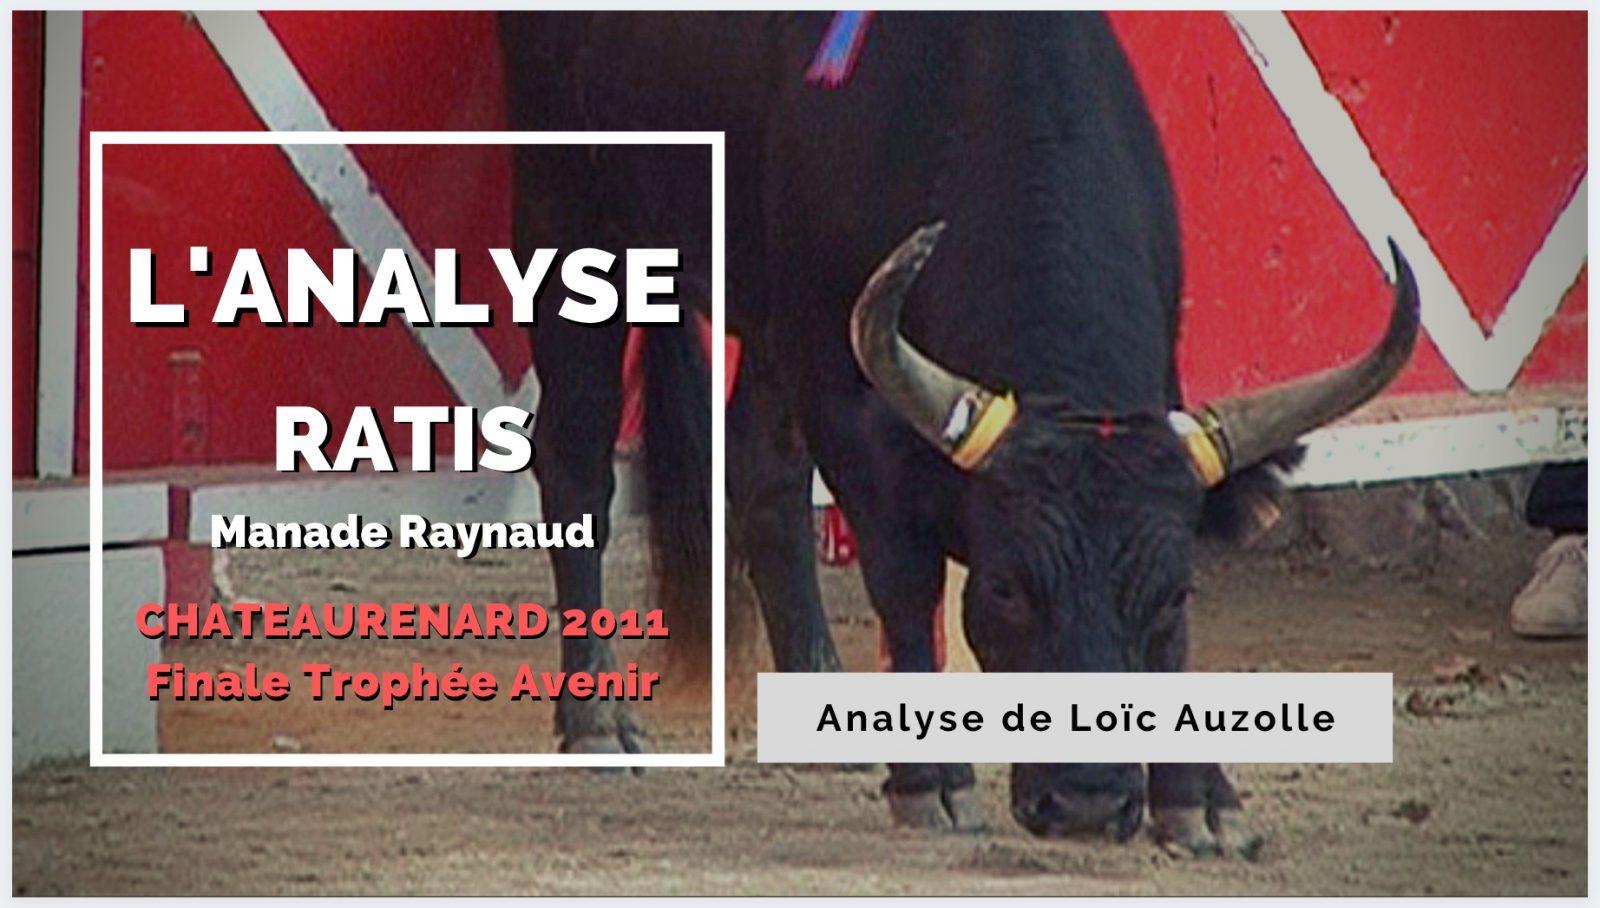 VIDEO // L'ANALYSE – RATIS (Manade Raynaud) – CHATEAURENARD Finale Avenir 2011 – AU FIL DES BARRIERES